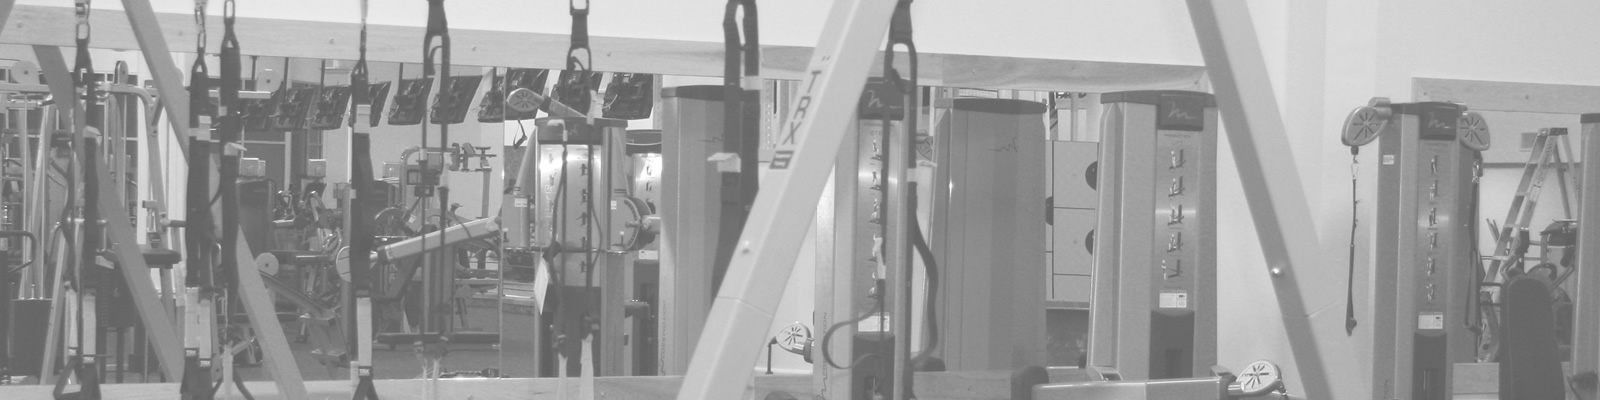 workout world wall nj gym